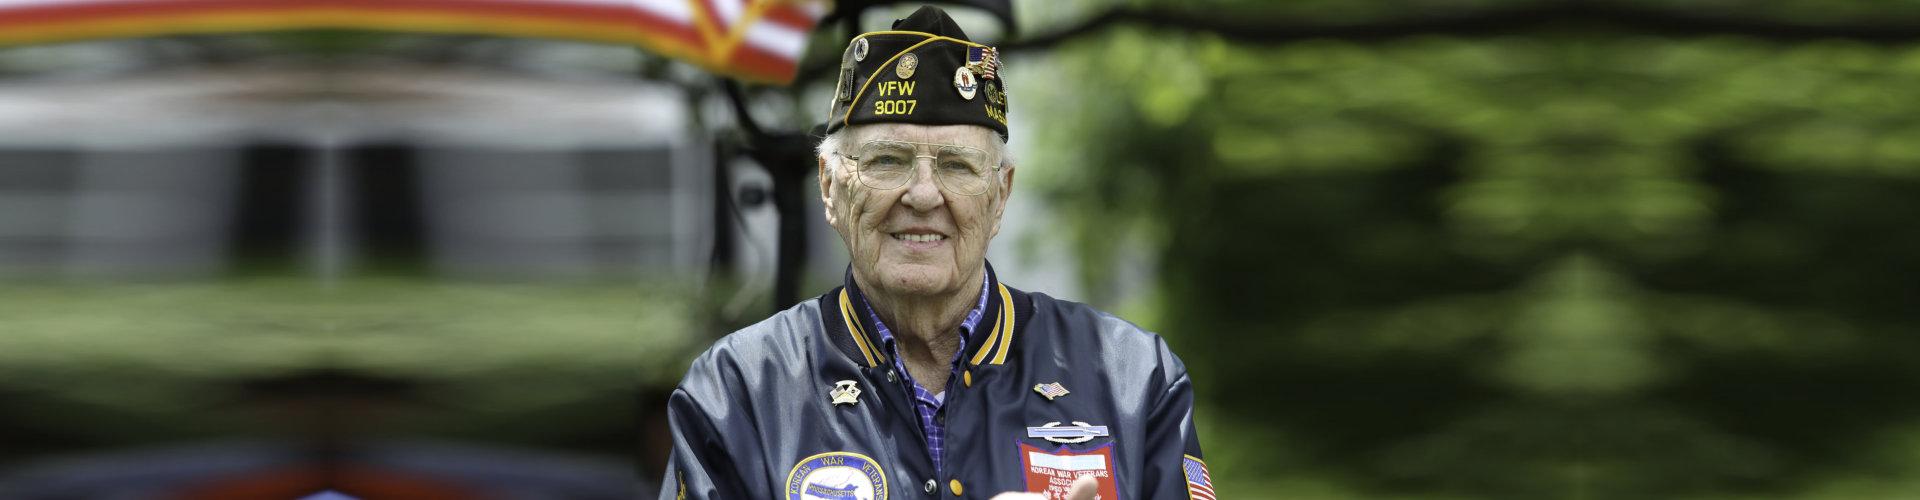 veteran at holiday ceremony